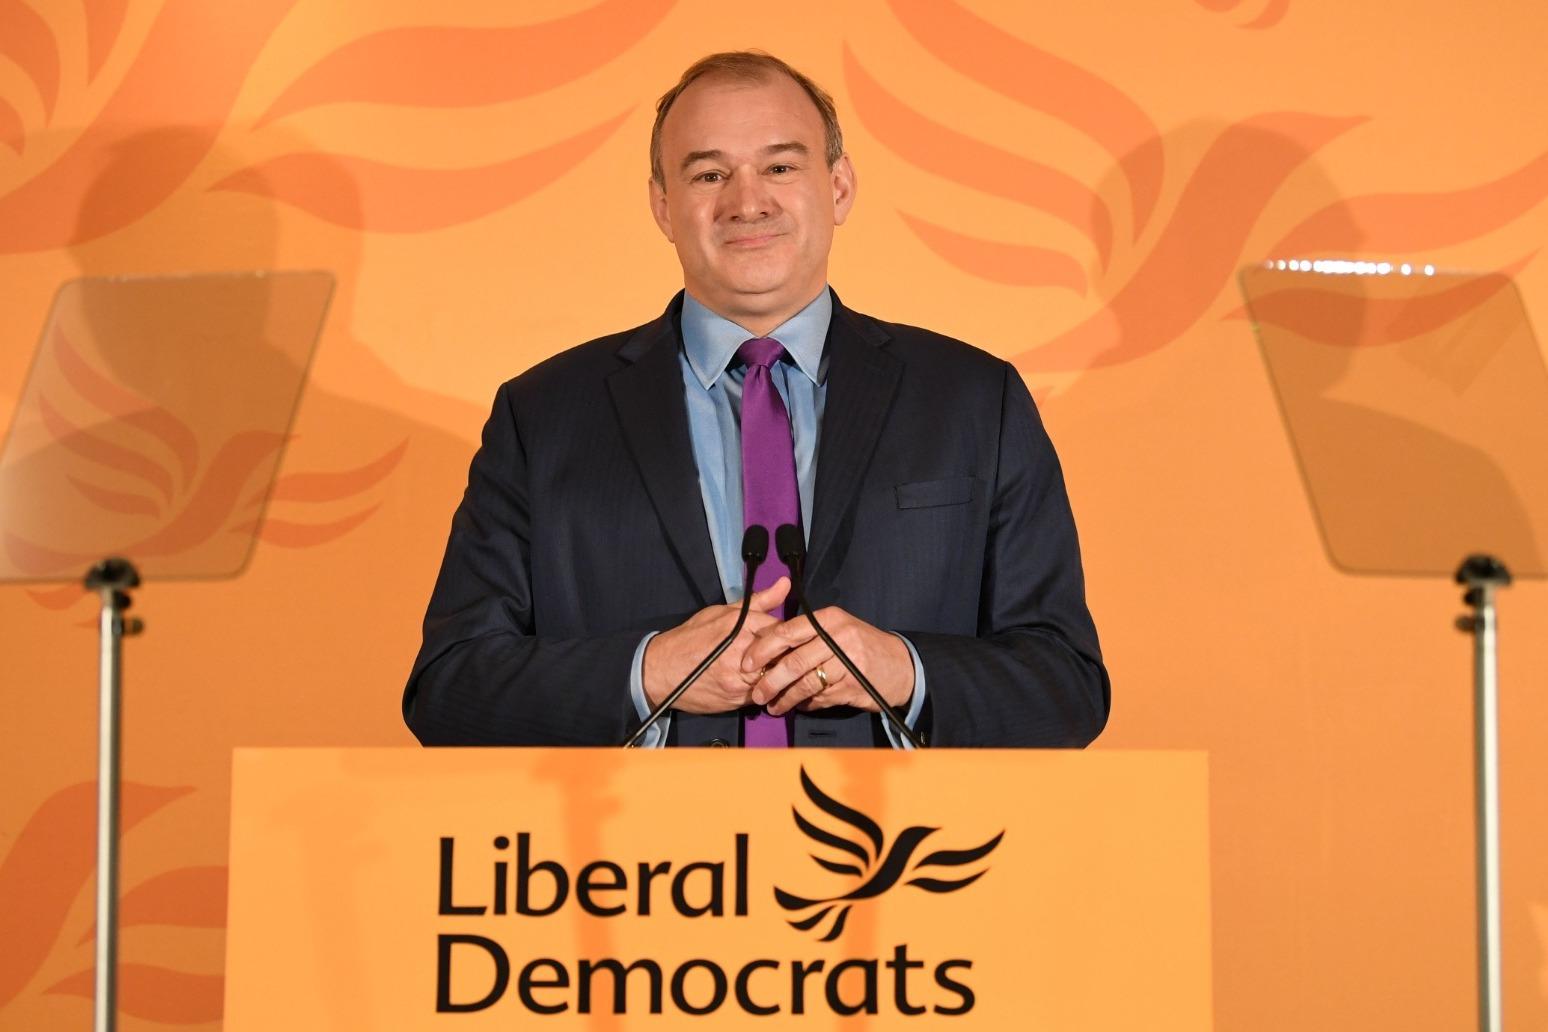 Davey elected Lib Dems leader